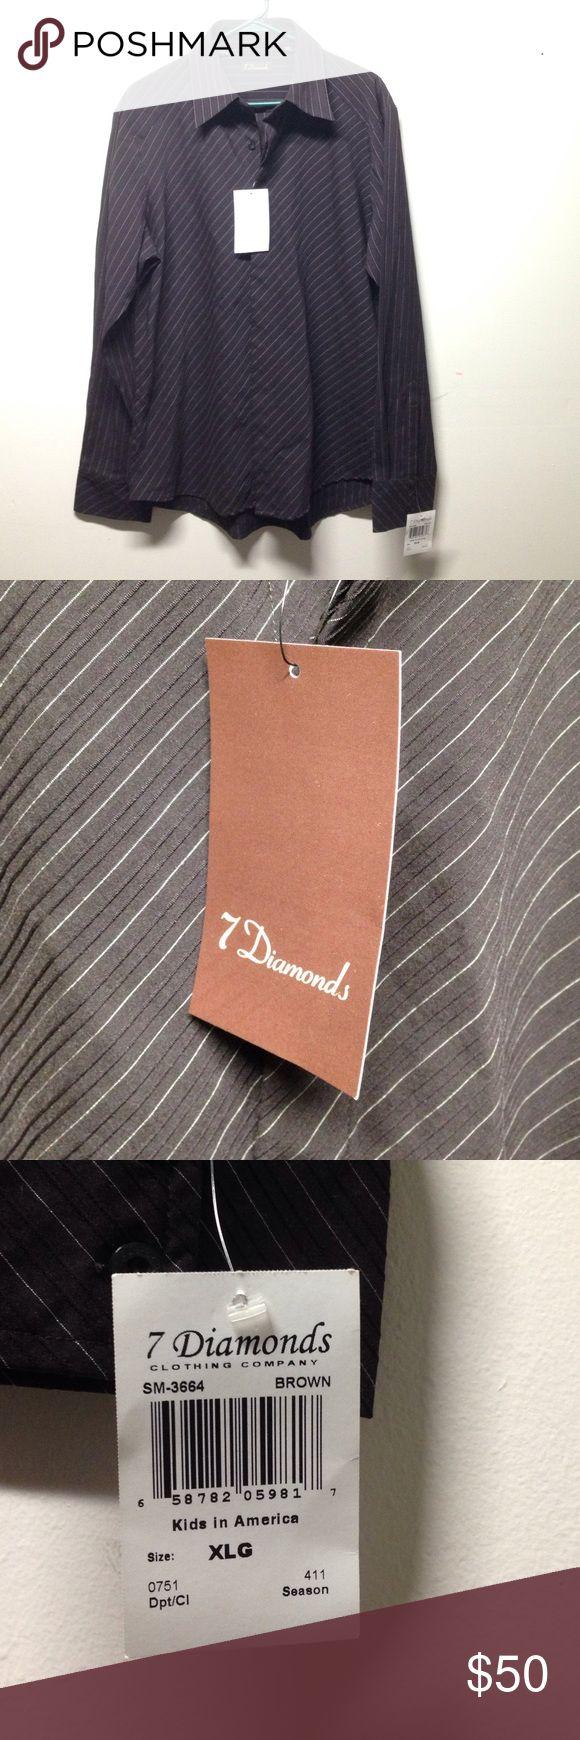 NWT size(XL) 7 Diamonds shirt NWT no defects 7 Diamonds Shirts Dress Shirts